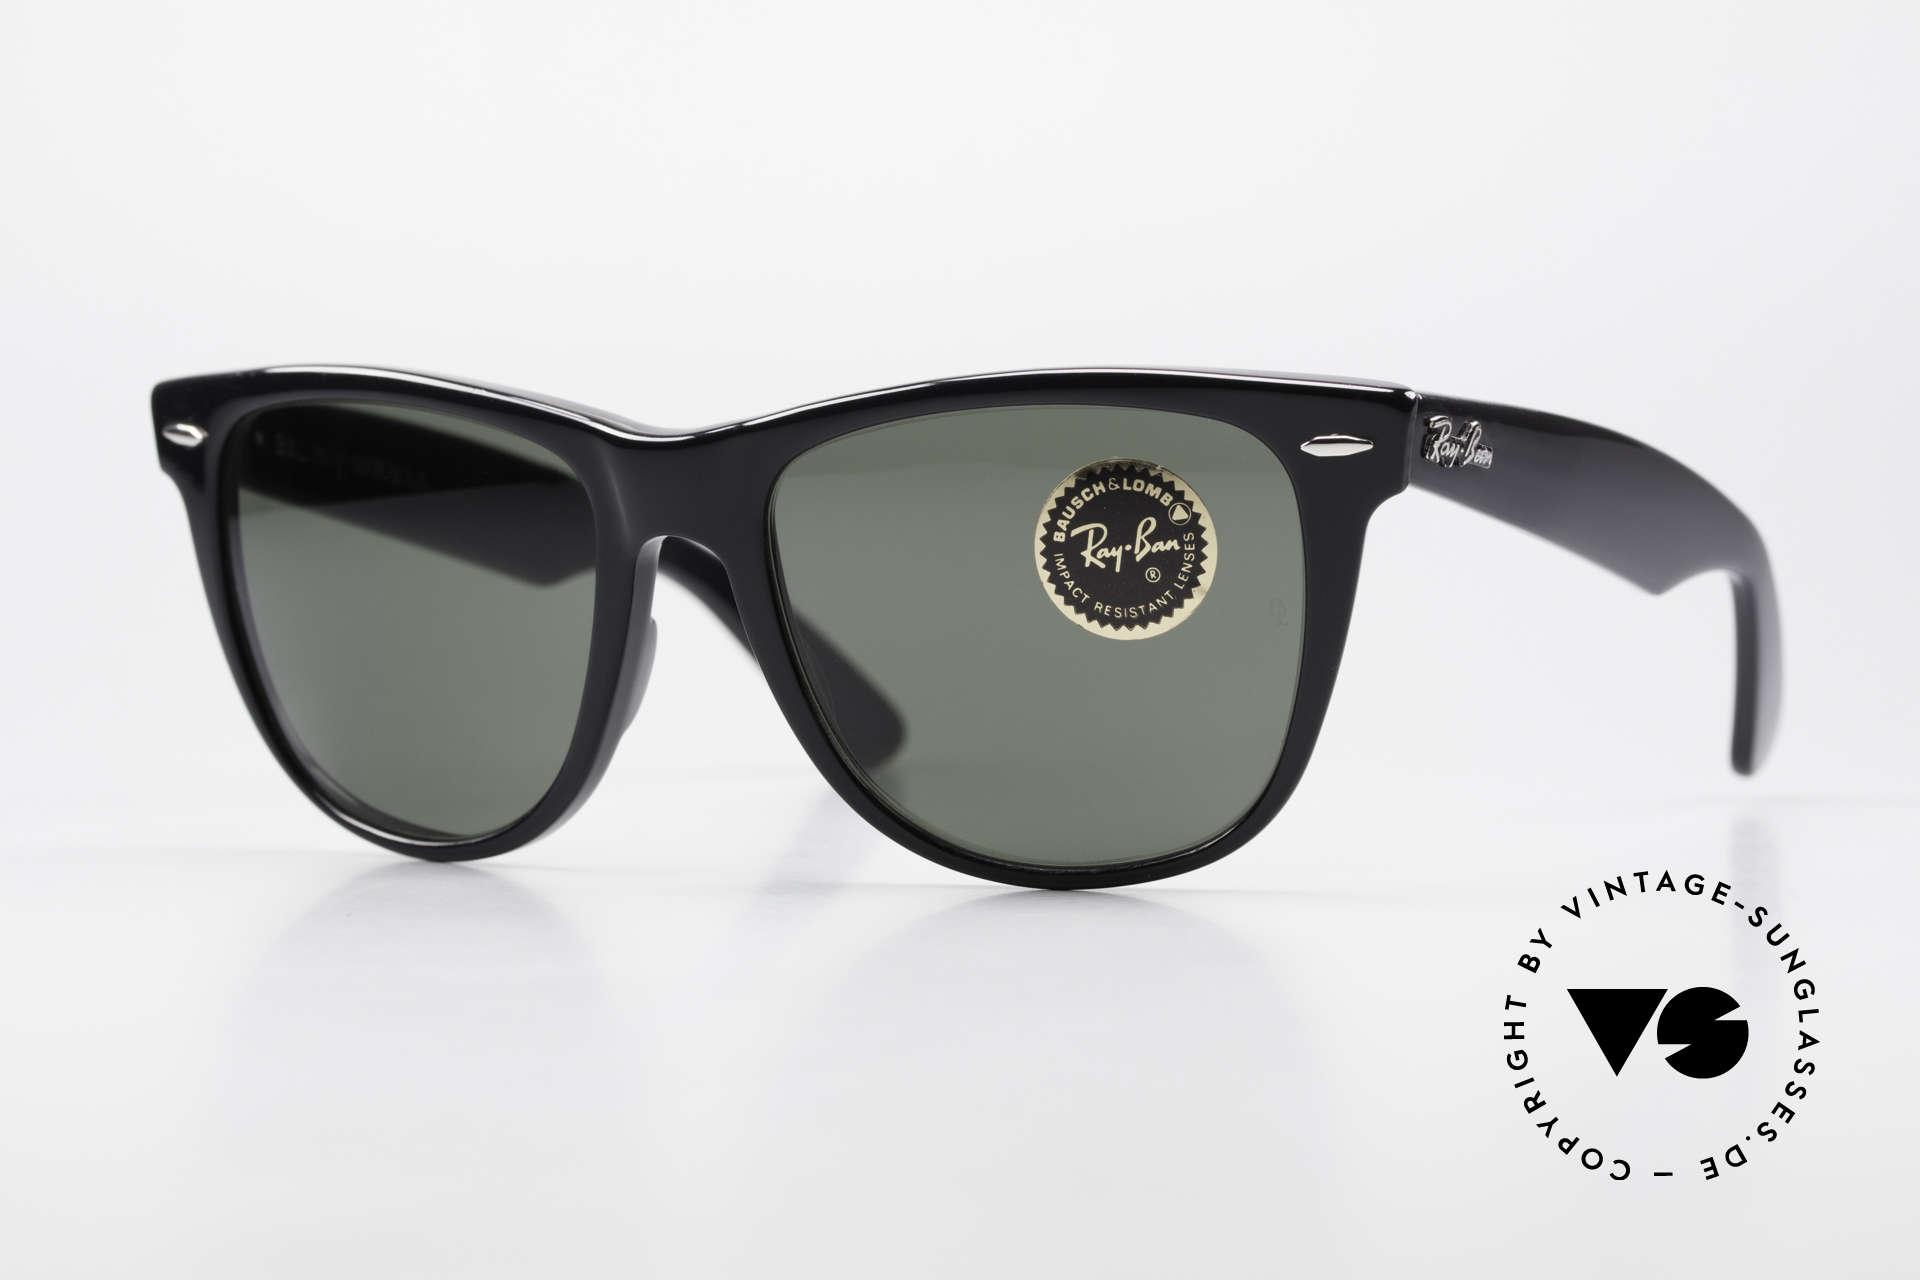 Ray Ban Wayfarer II JFK USA Vintage Sunglasses, vintage RAY-BAN Wayfarer II 1980's sunglasses, Made for Men